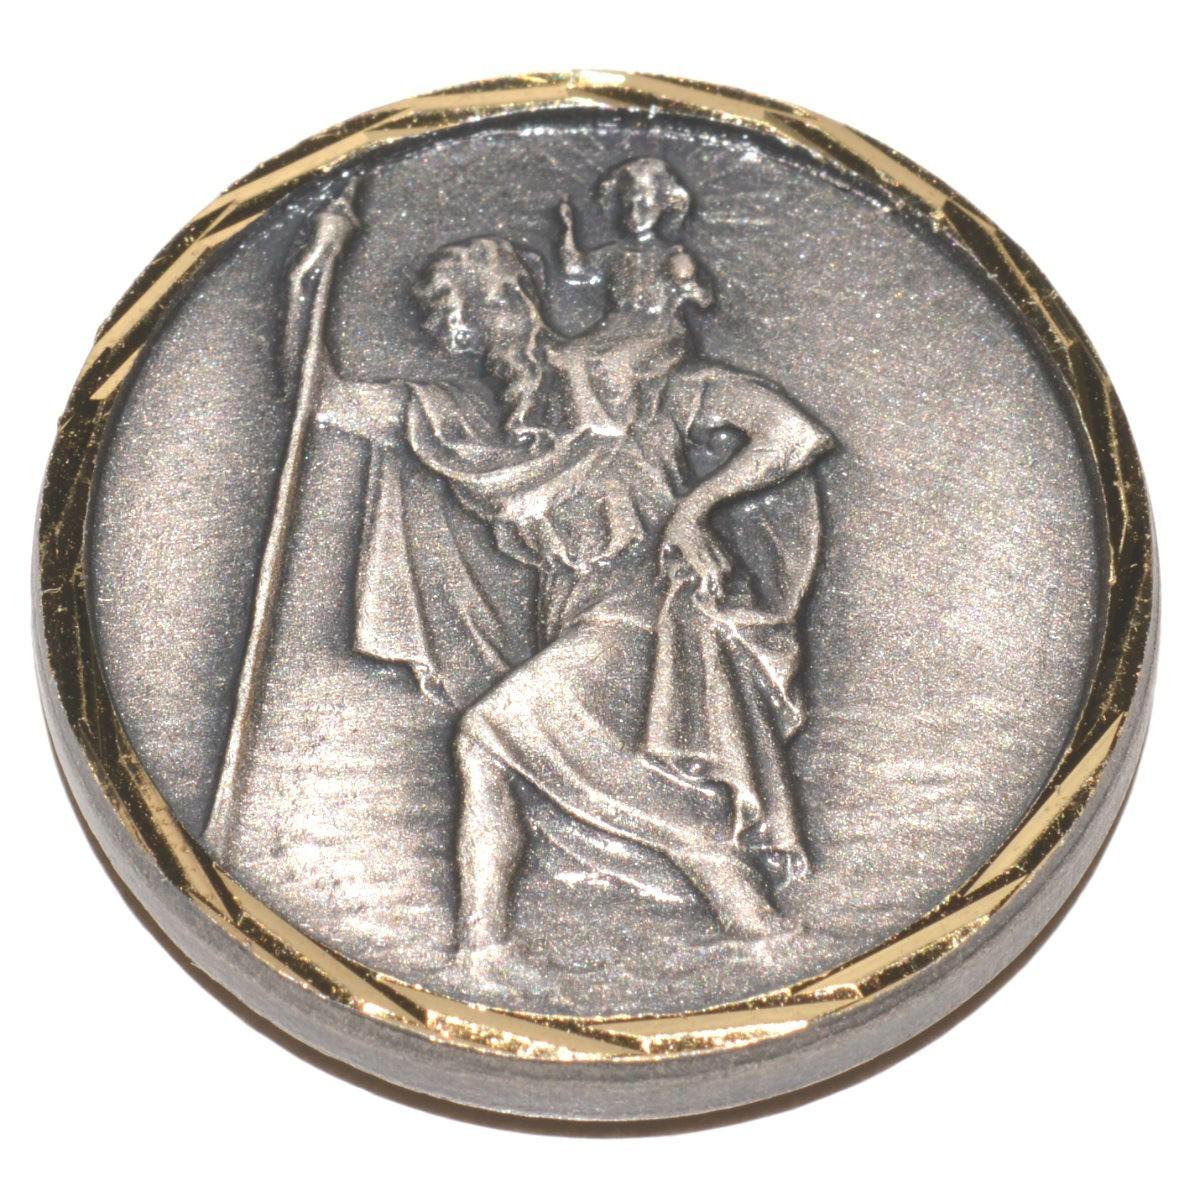 medaille st christophe en bronze argent plaque magnetique pour voiture objets de pi t. Black Bedroom Furniture Sets. Home Design Ideas